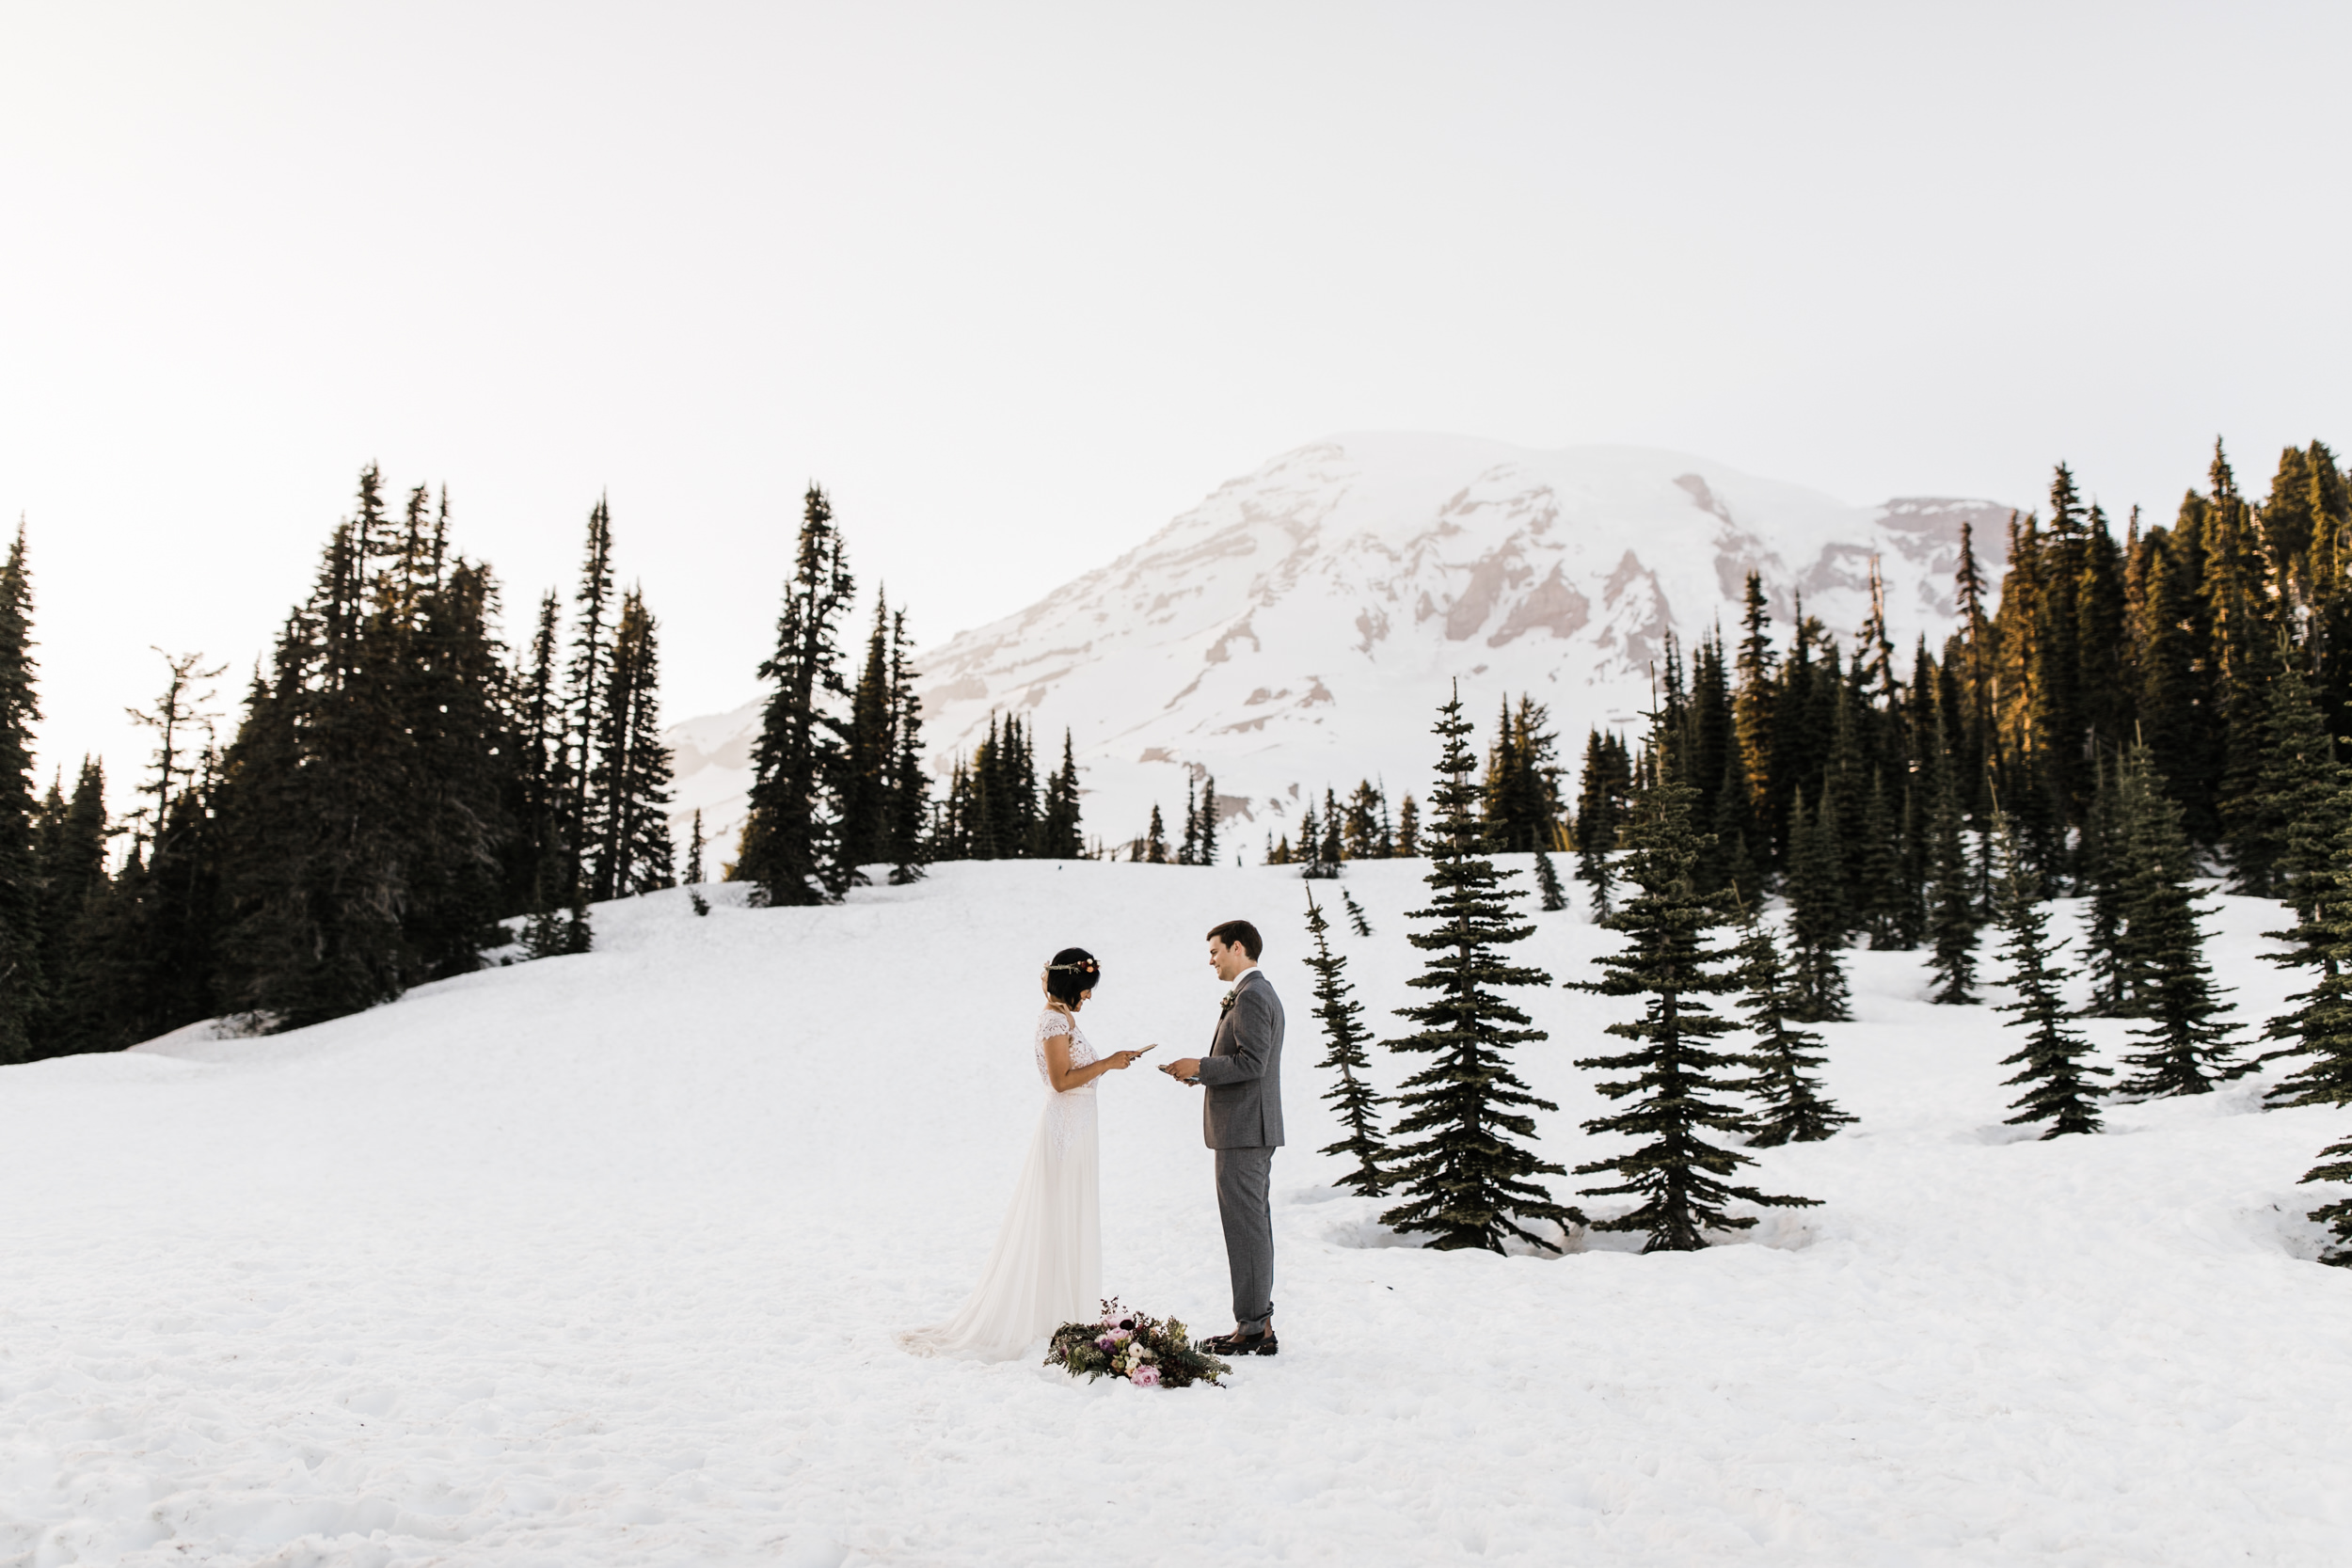 Hearnes-Elopement-Photographers-Mount-Rainier-National-Park-Intimate-Wedding-Cabin-Wedding-Woodsy-Reception-Snowy-Elopement-54.jpg